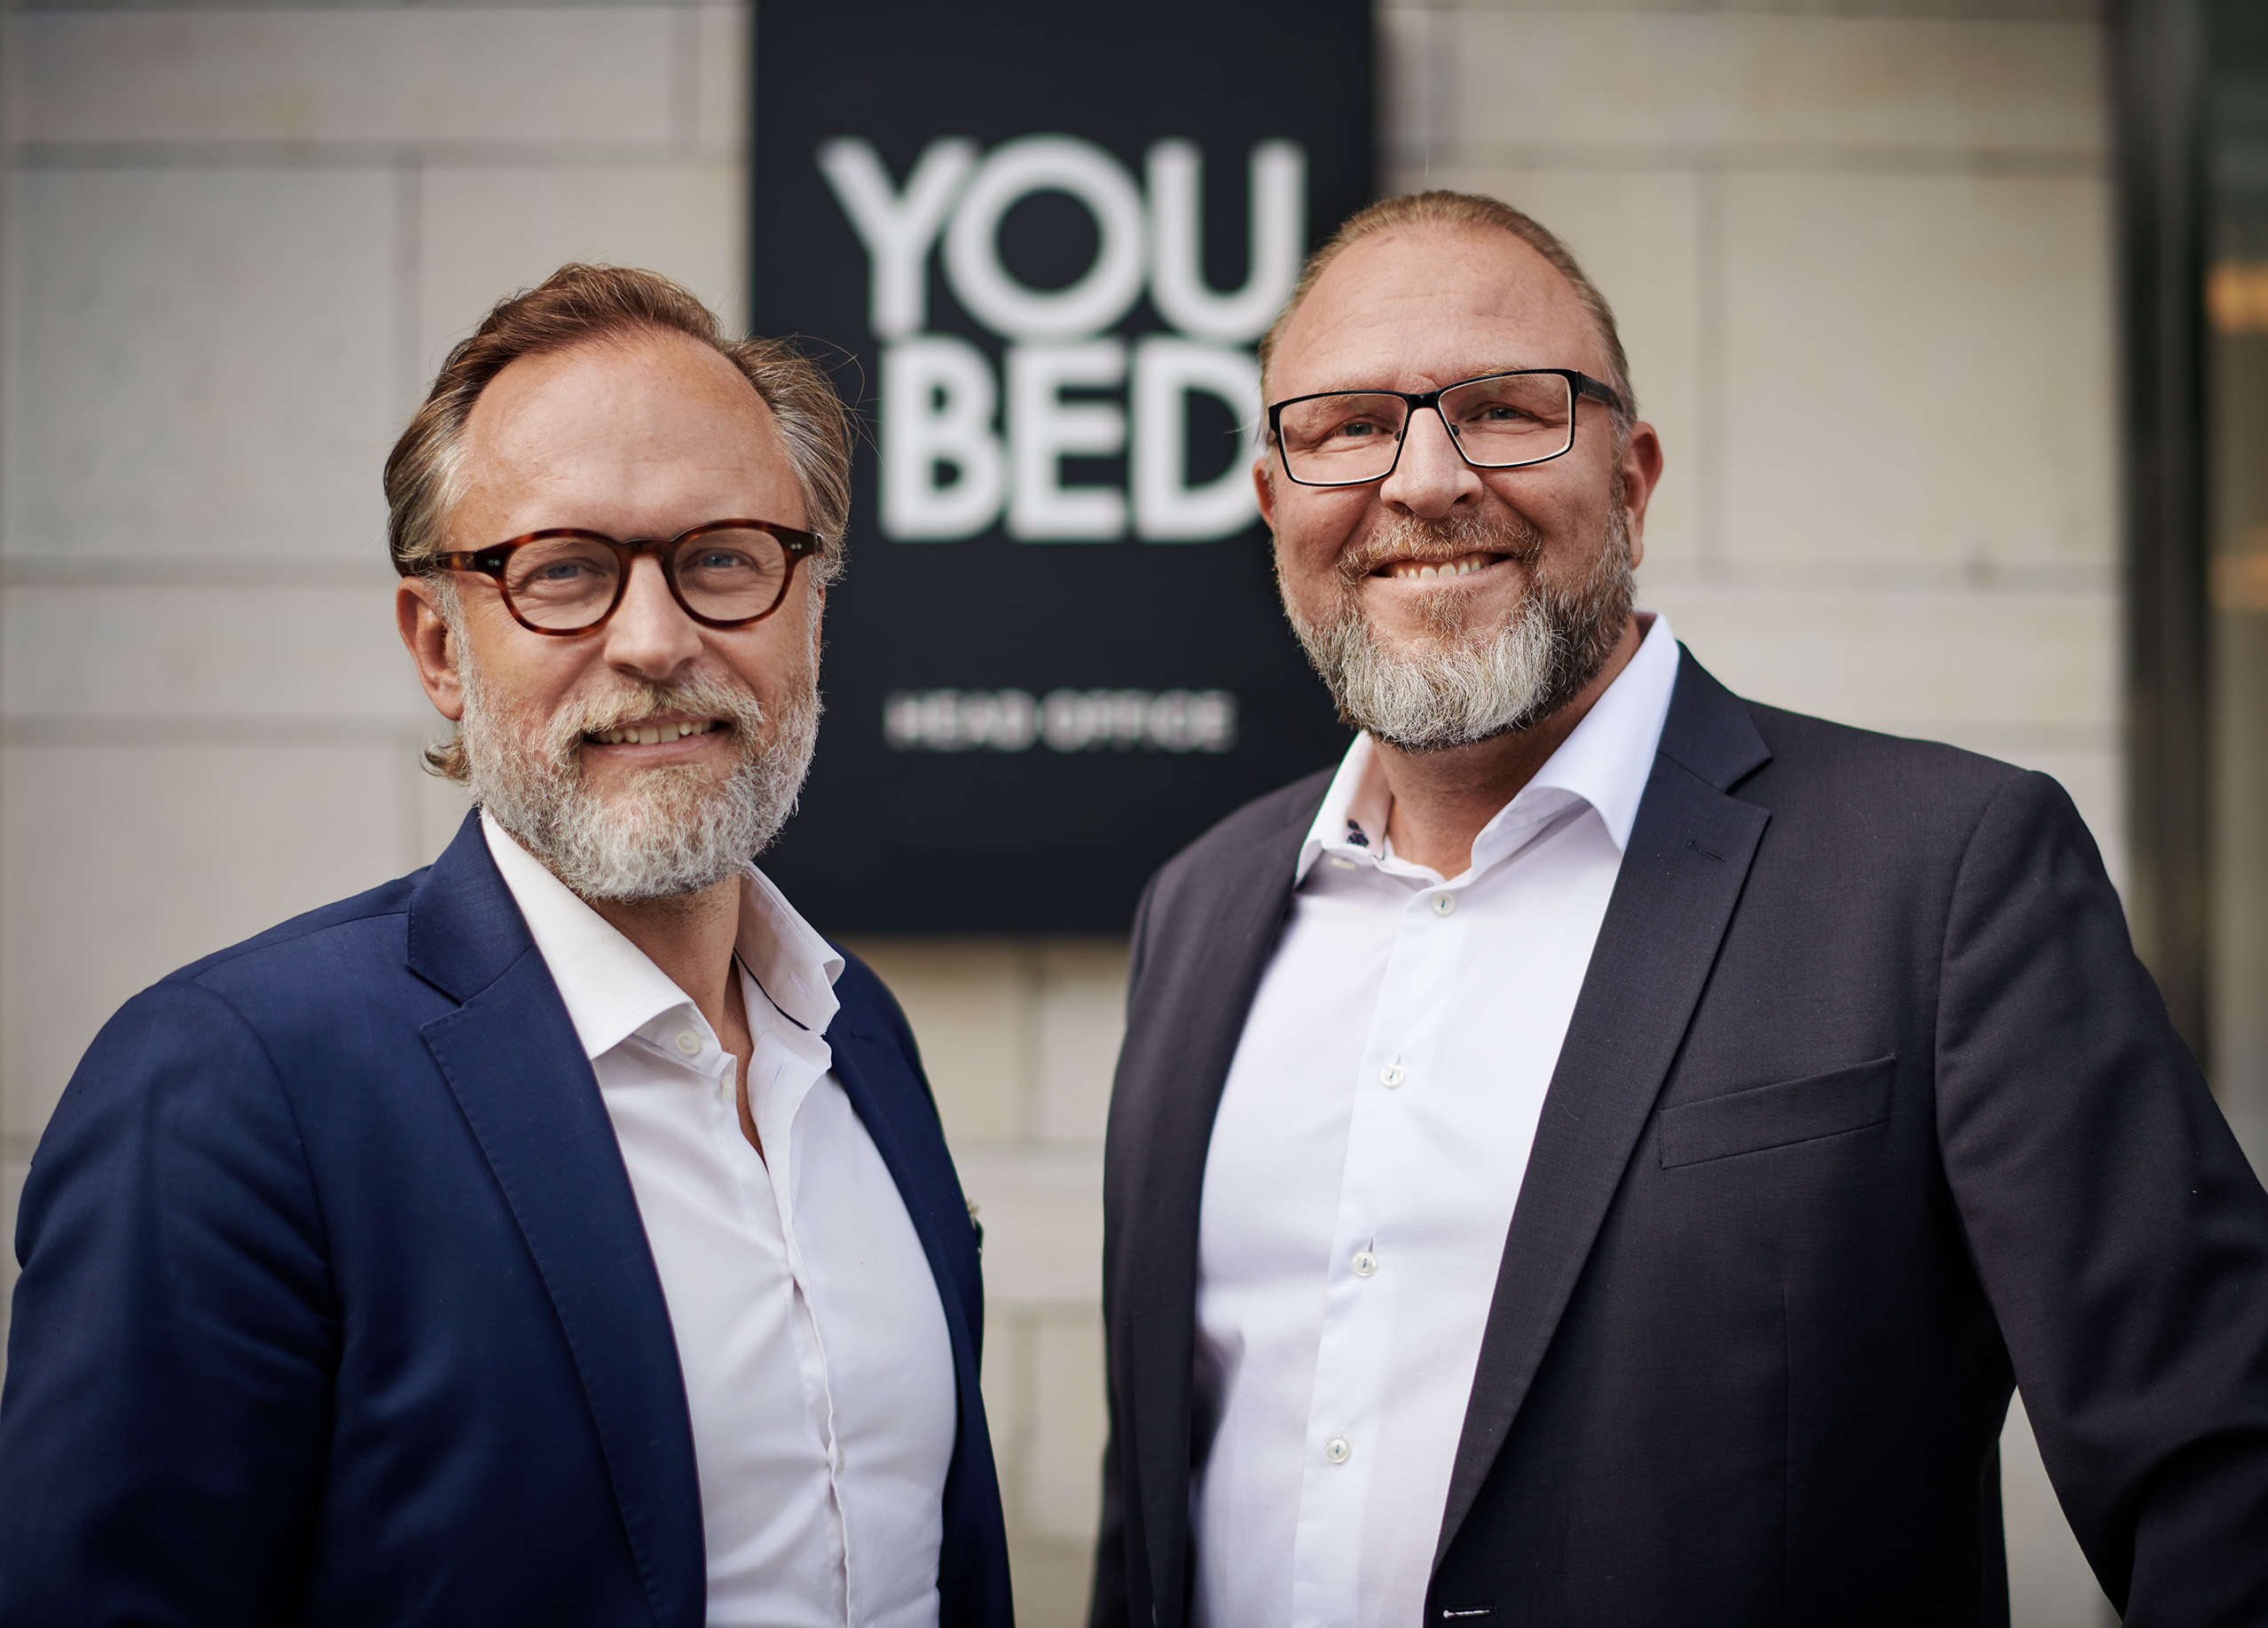 Swedish innovation revolutionises the global hotel industry